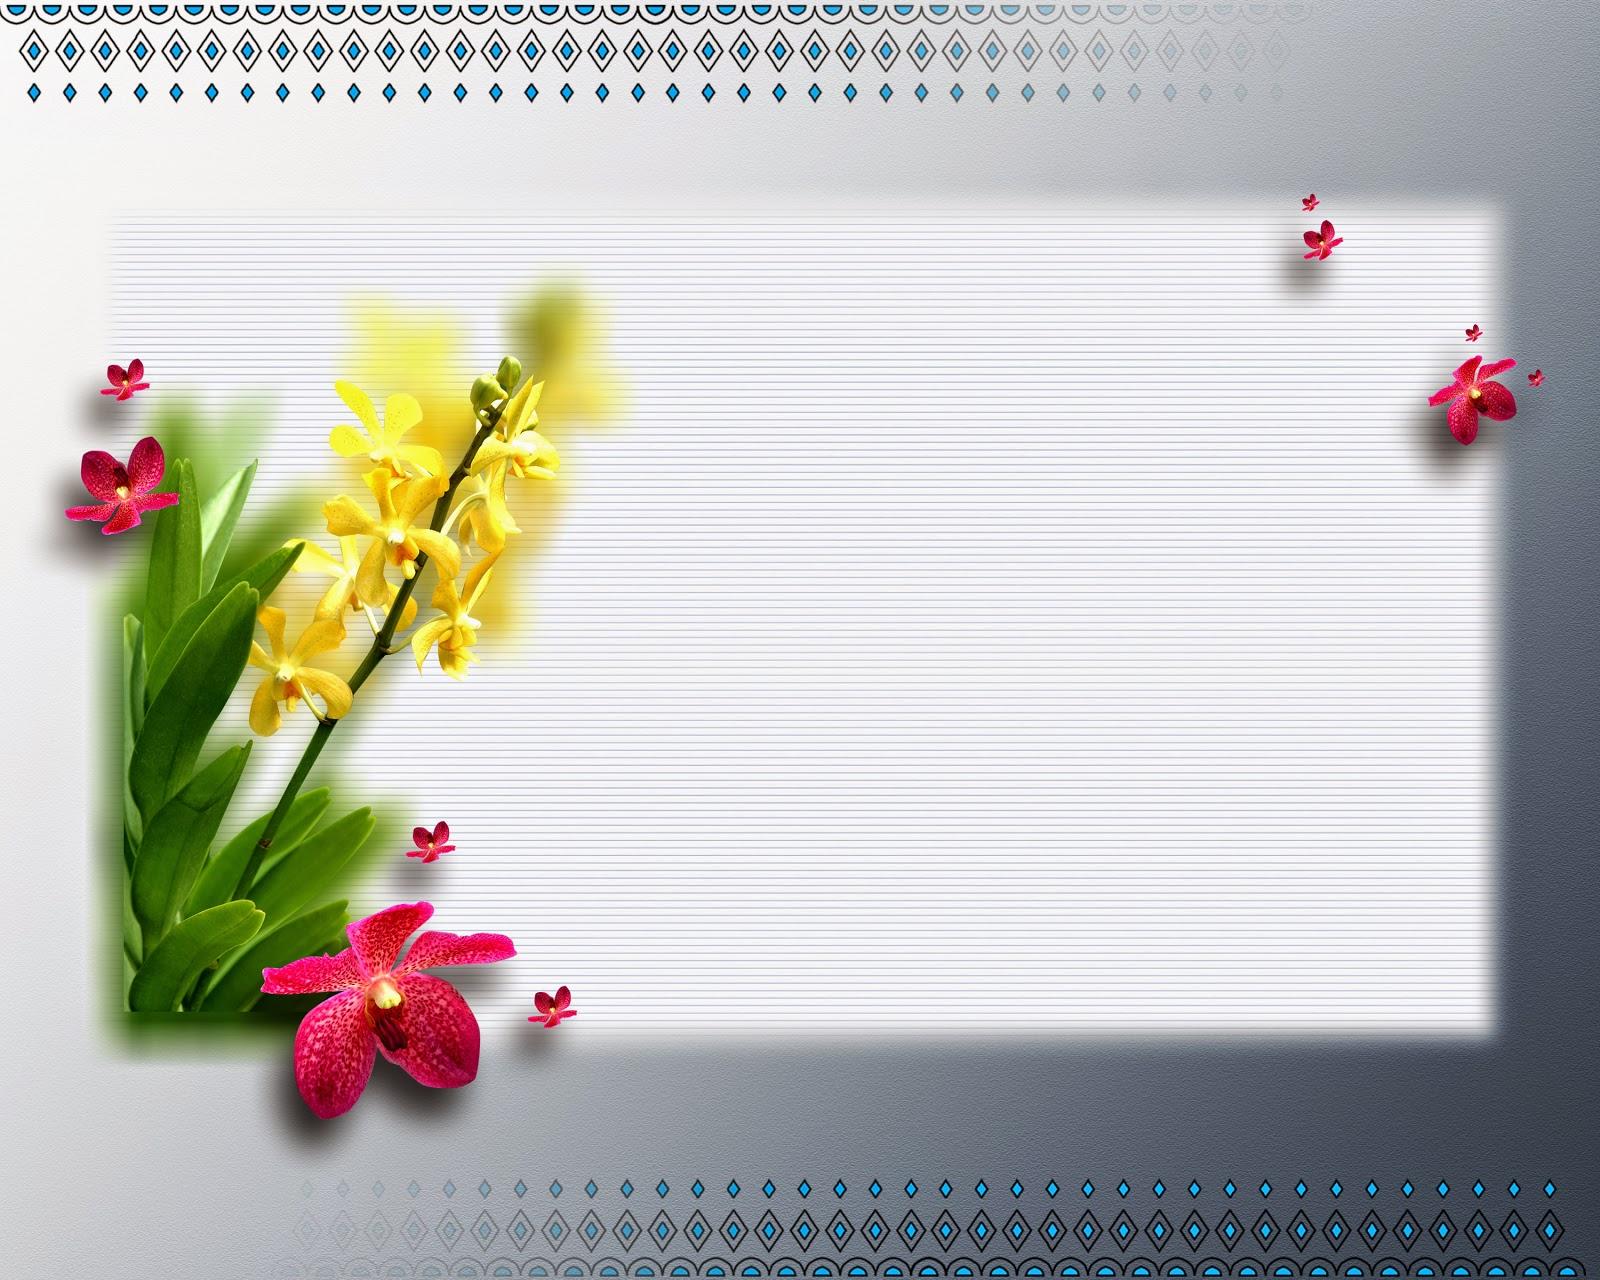 Wedding Photo Album Background 12x15 Psd File Download ...